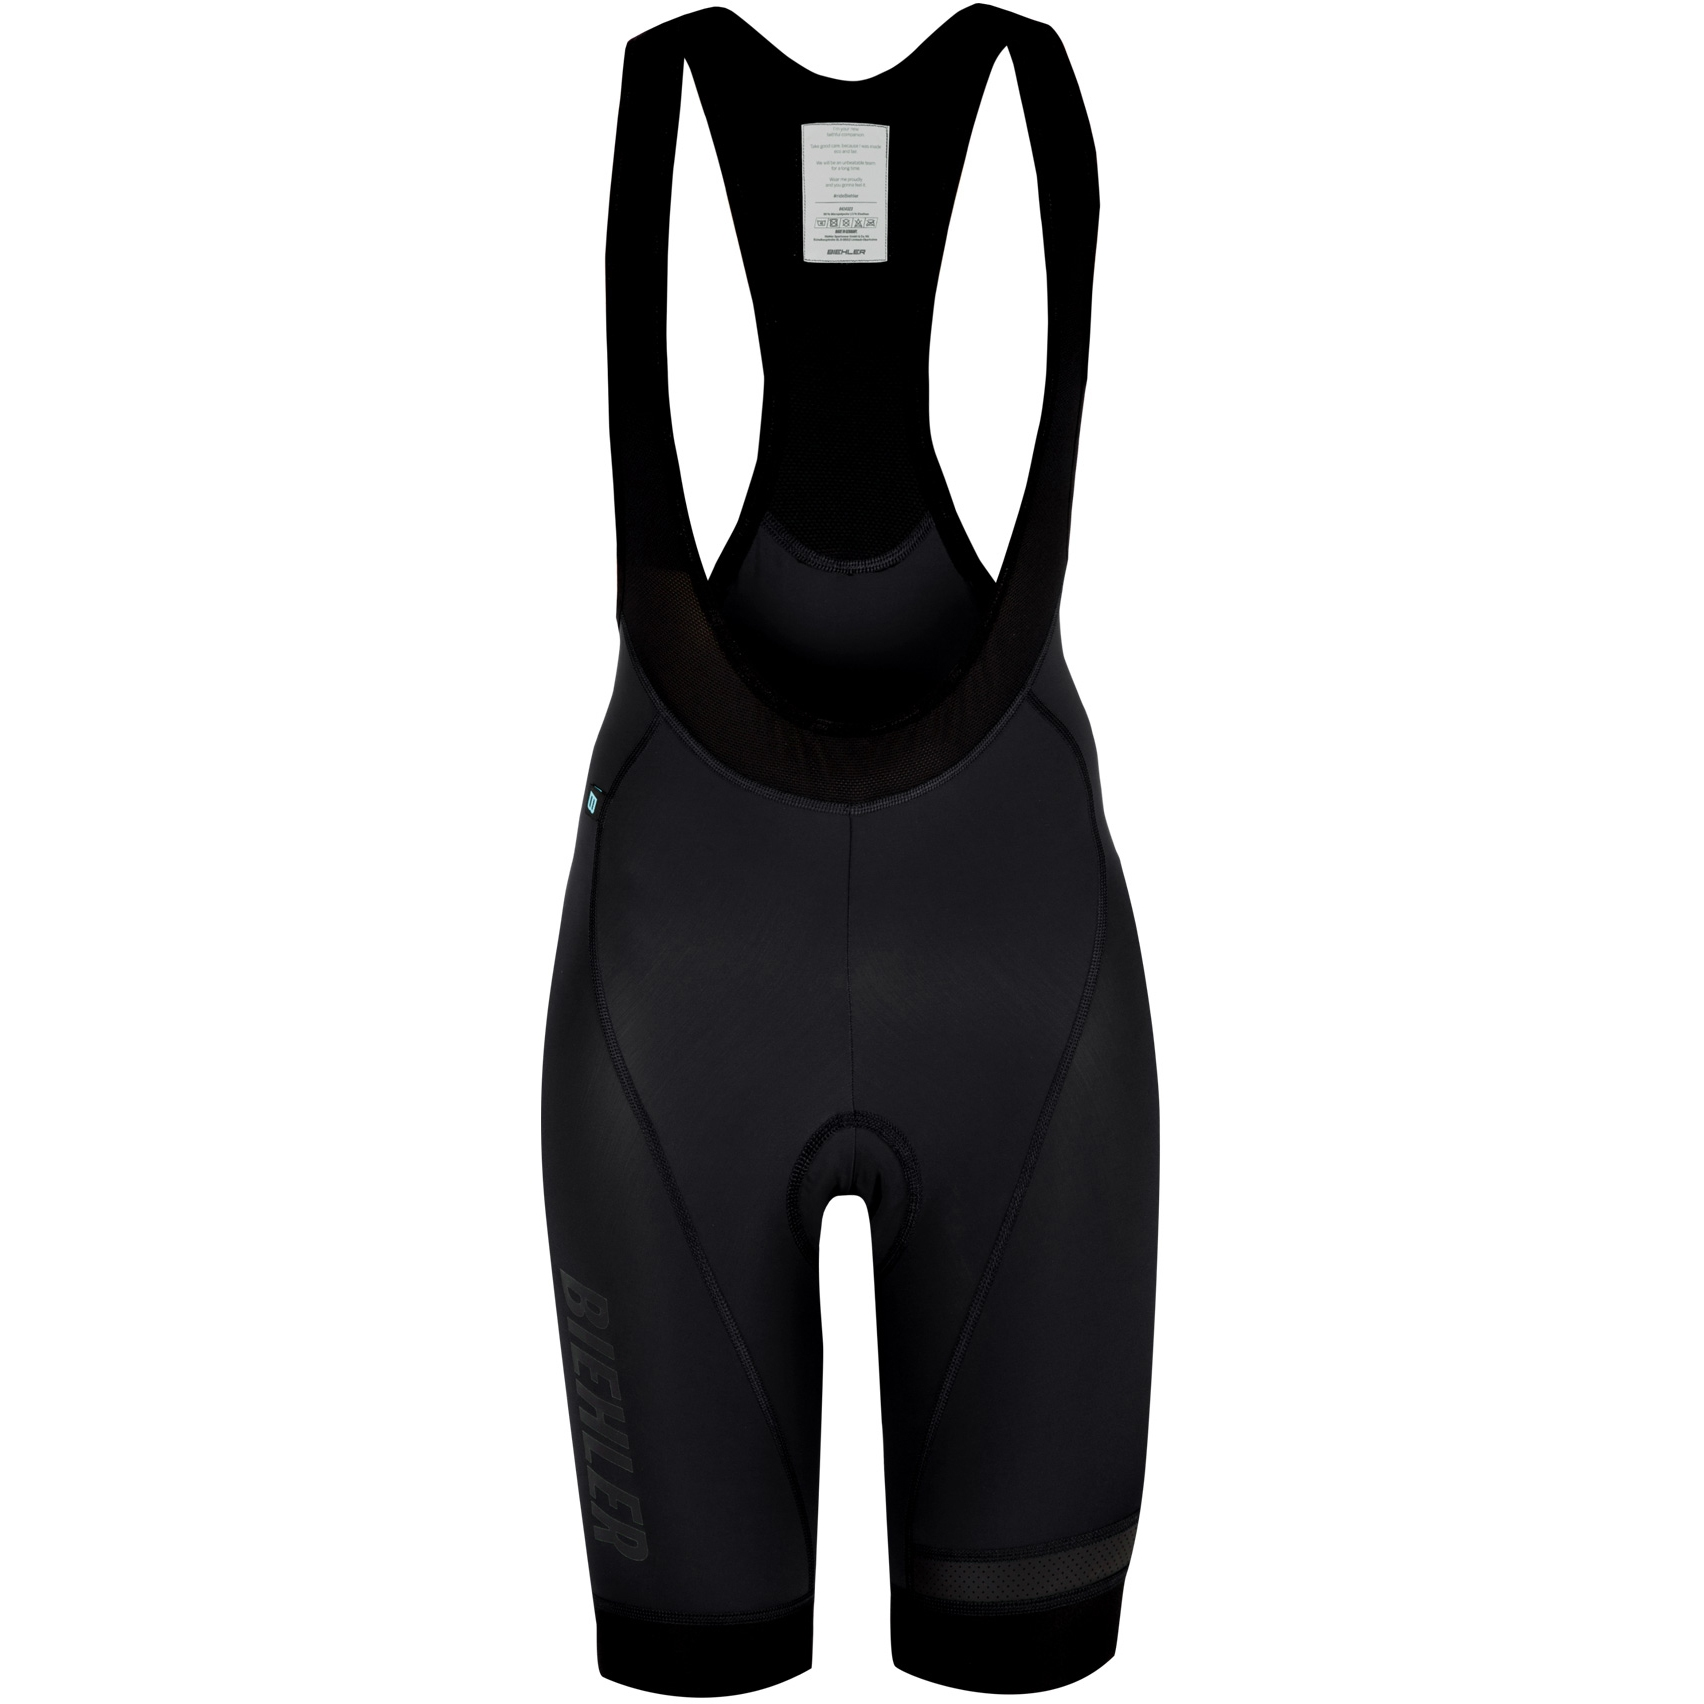 Biehler Neo Classic Signature³ Bib Shorts Women - black